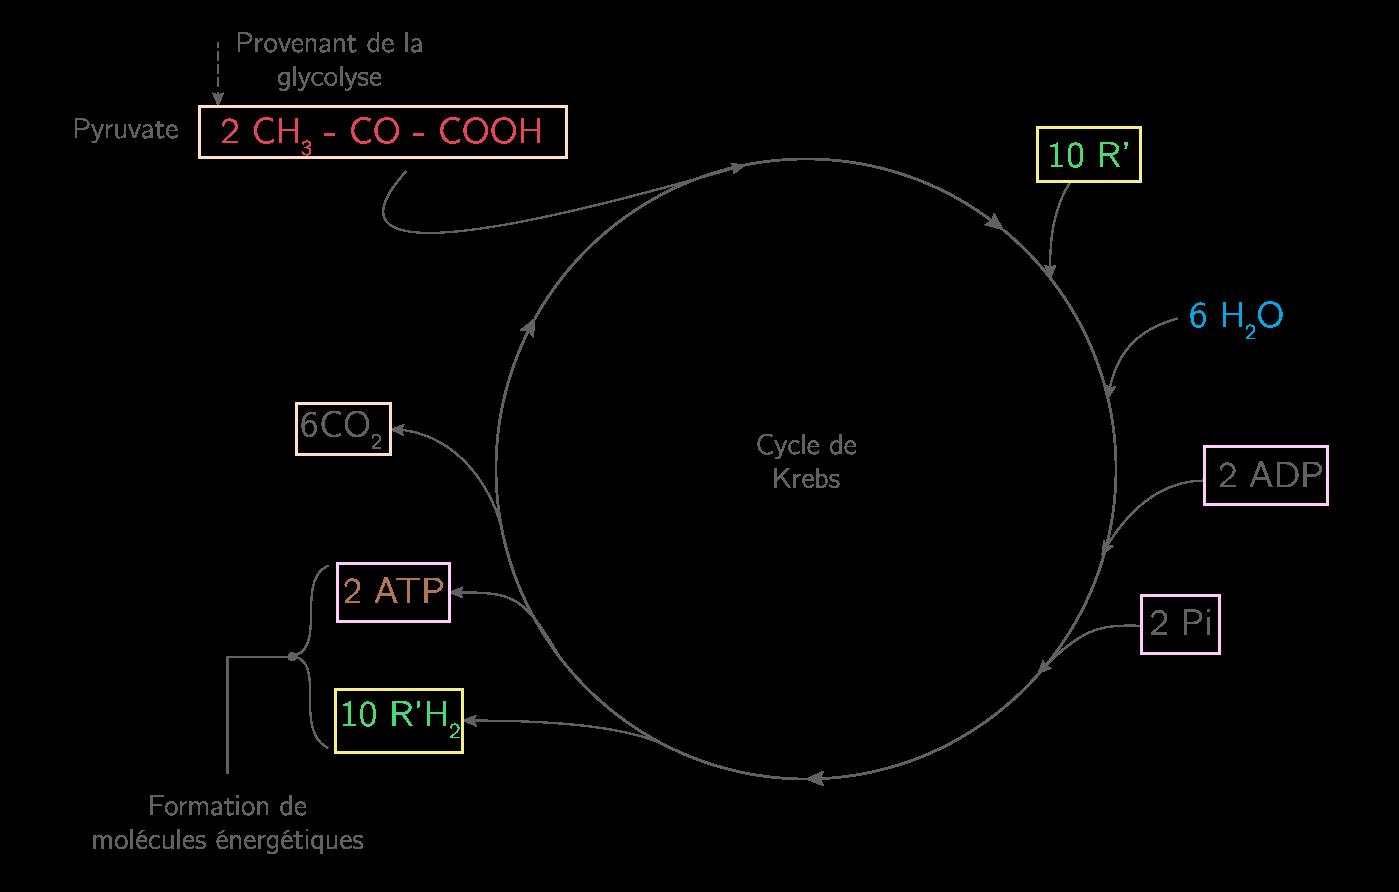 Le cycle de Krebs